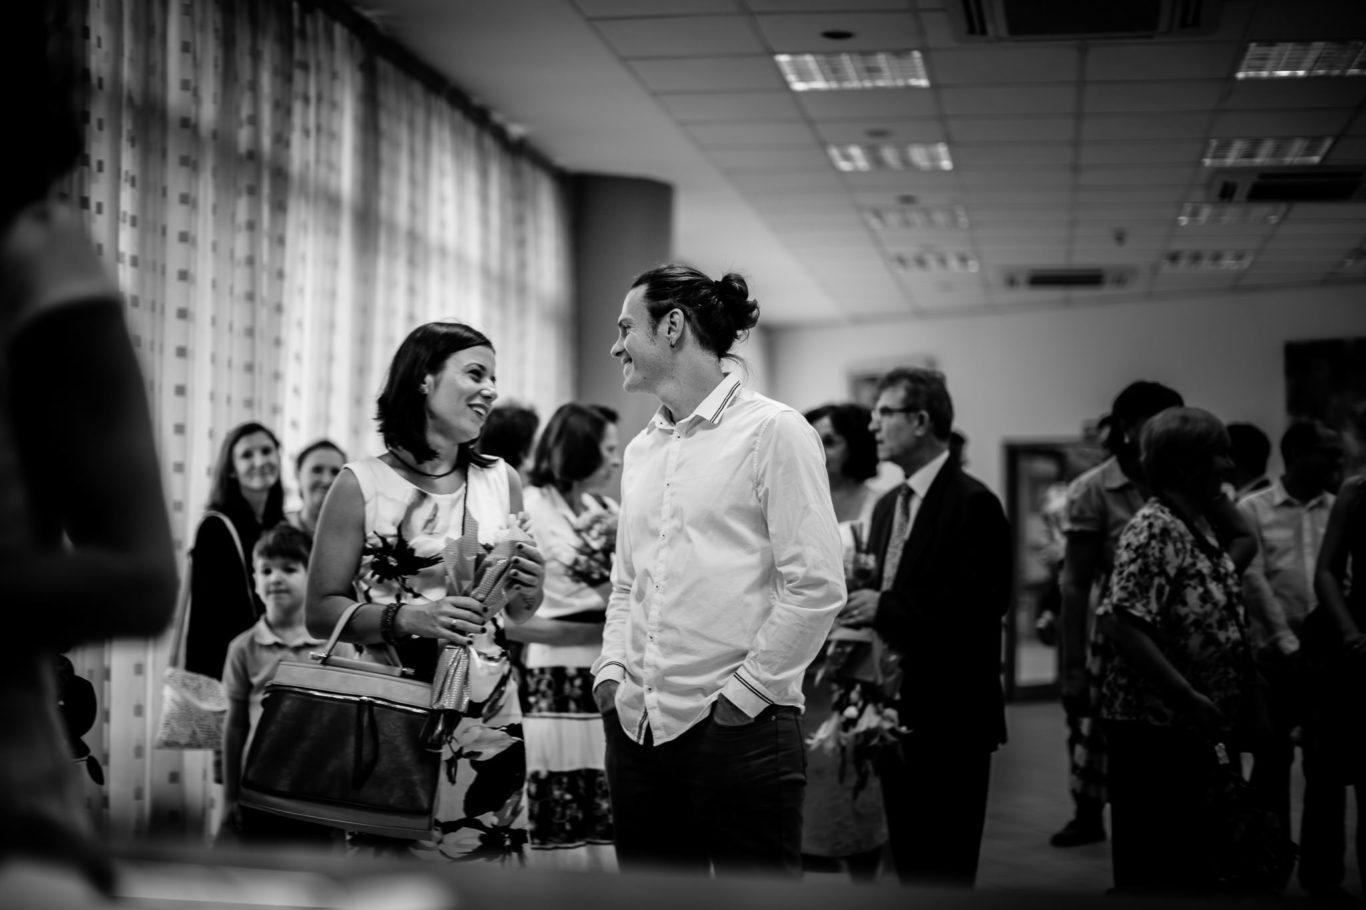 0058-fotografie-nunta-bucuresti-dana-radu-fotograf-ciprian-dumitrescu-cd2_6219